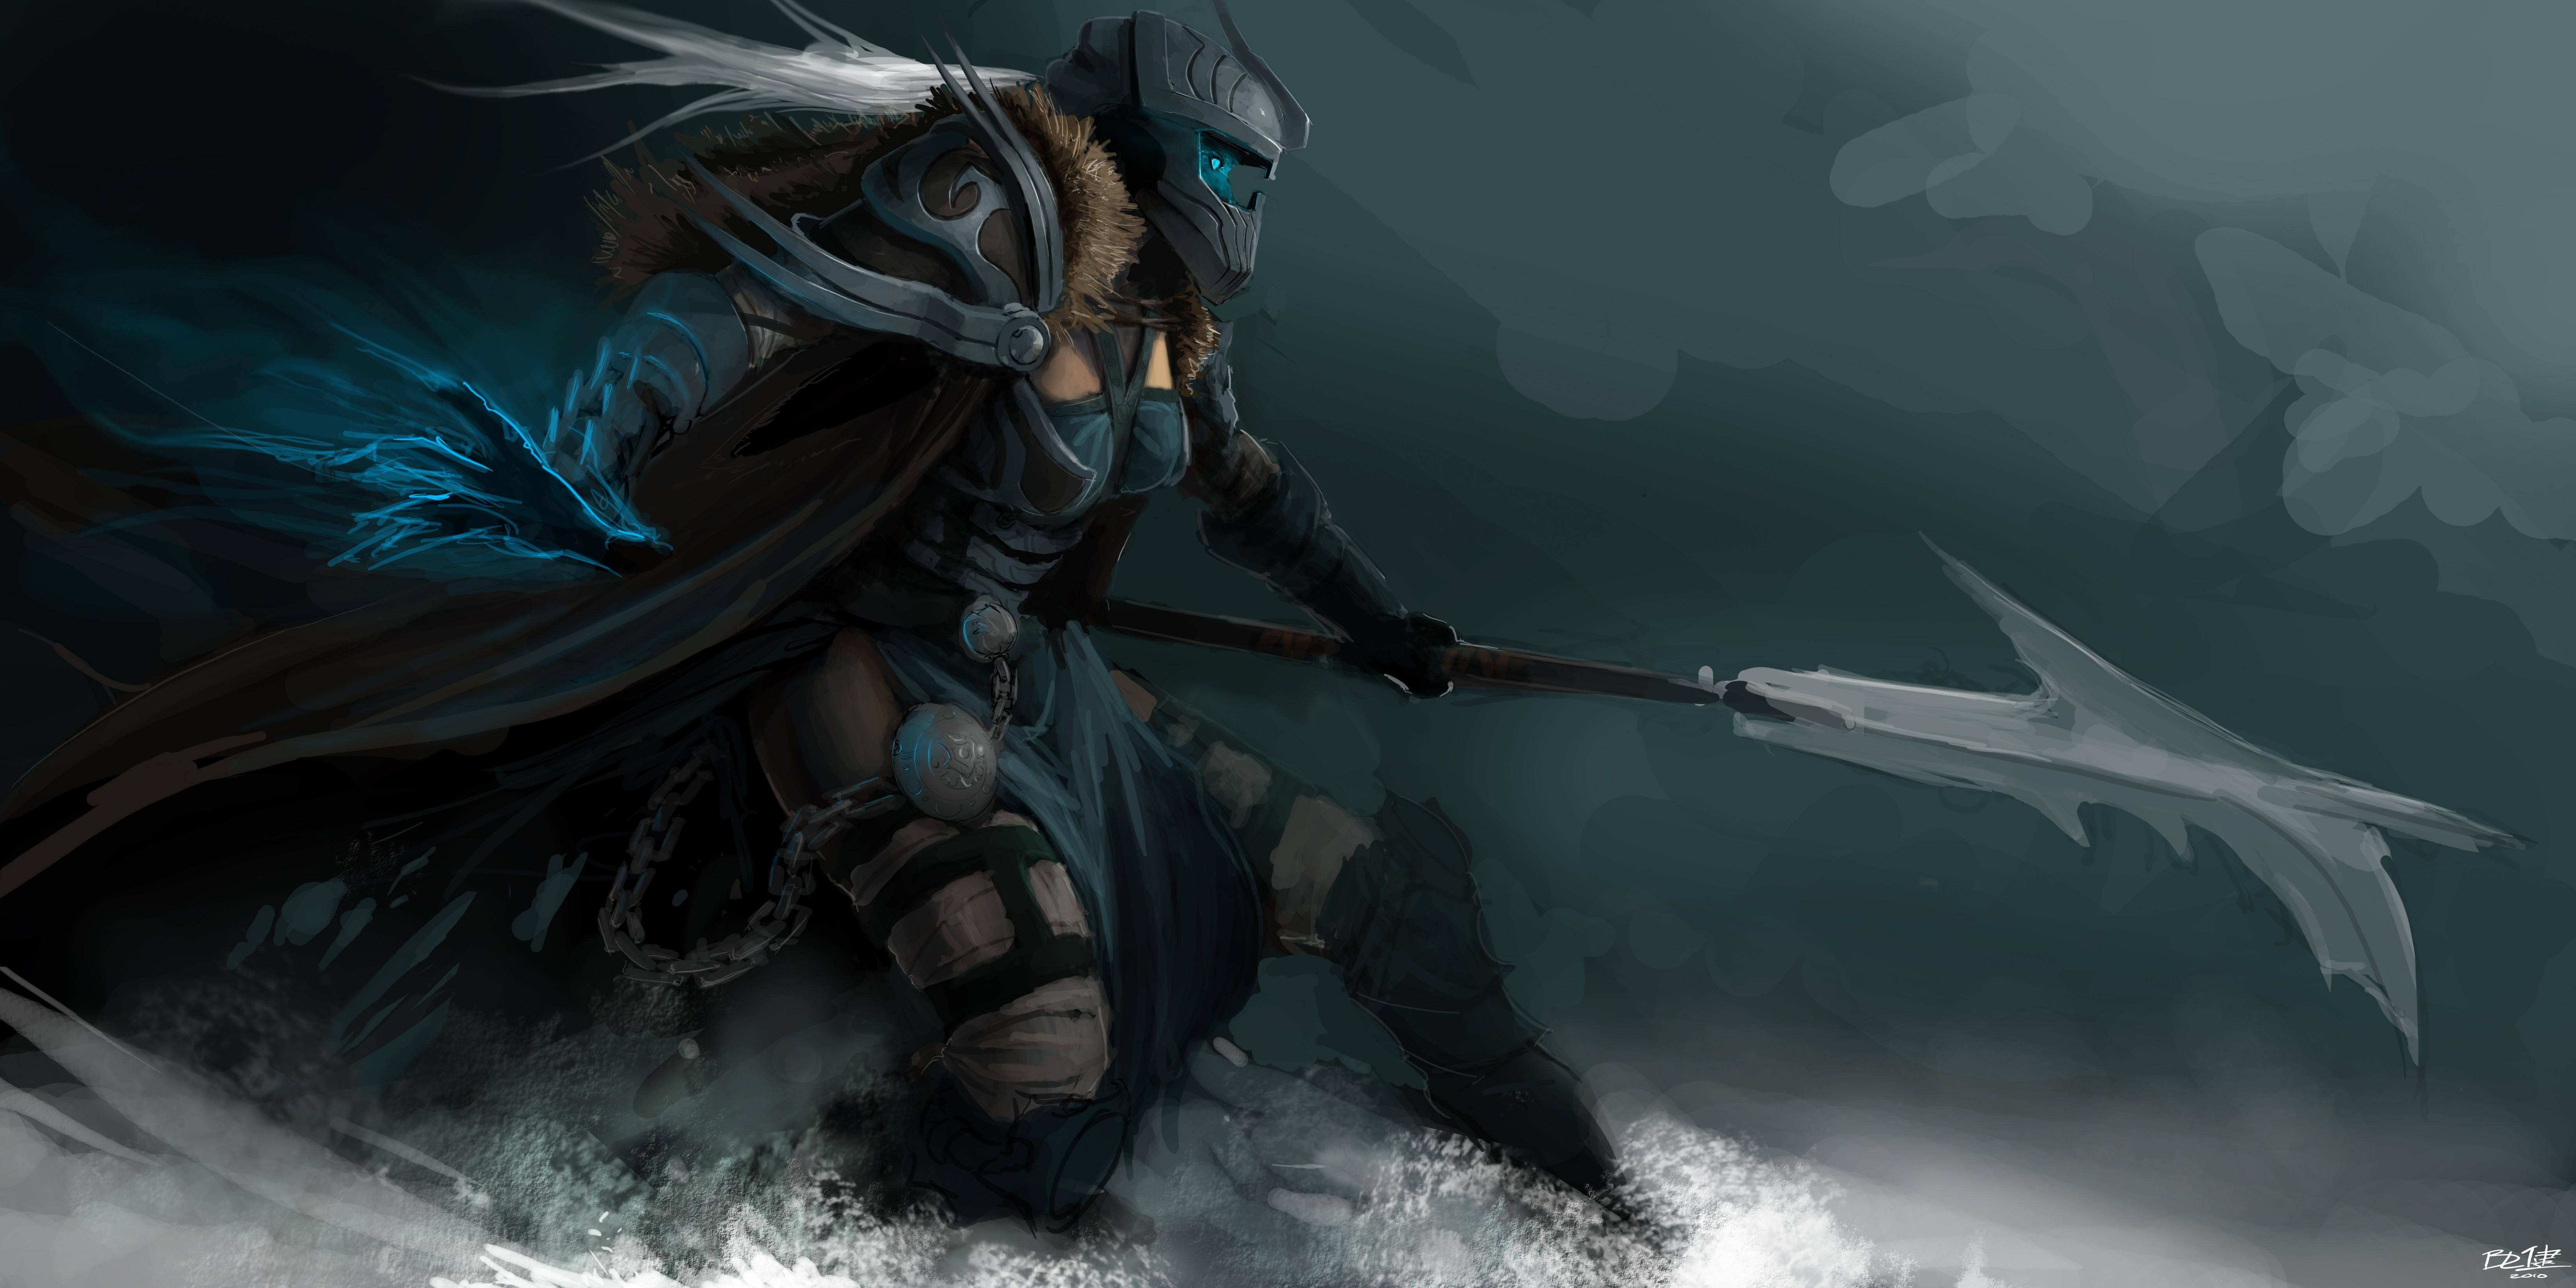 General 6600x3300 fantasy art fantasy girl artwork warrior